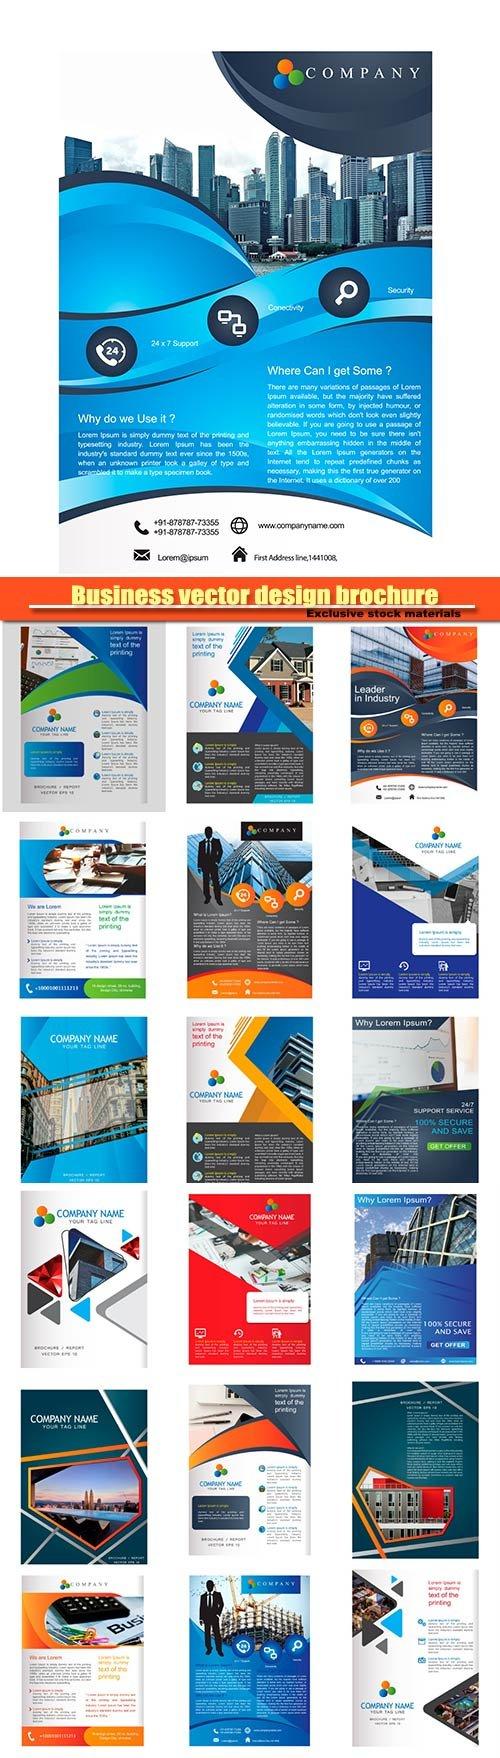 Business vector design brochure, banner template